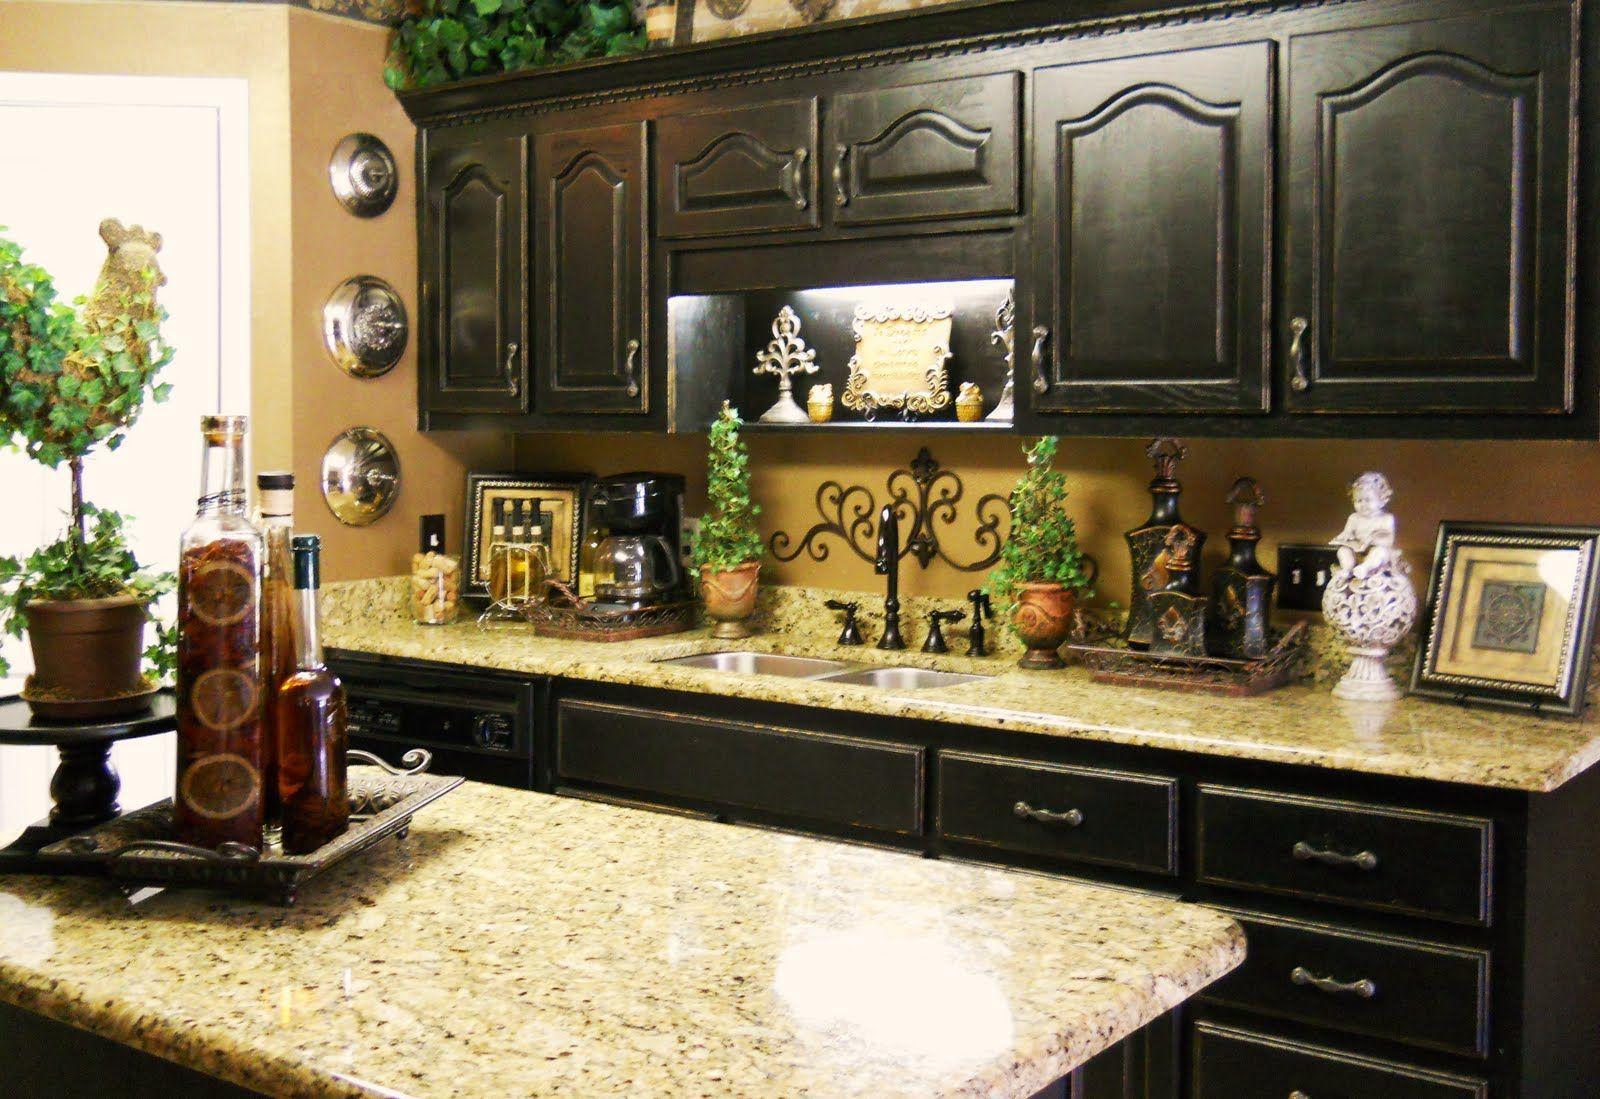 Southern Charm Let S Visit The Kitchen Kitchen Counter Decor Wine Decor Kitchen Tuscan Kitchen